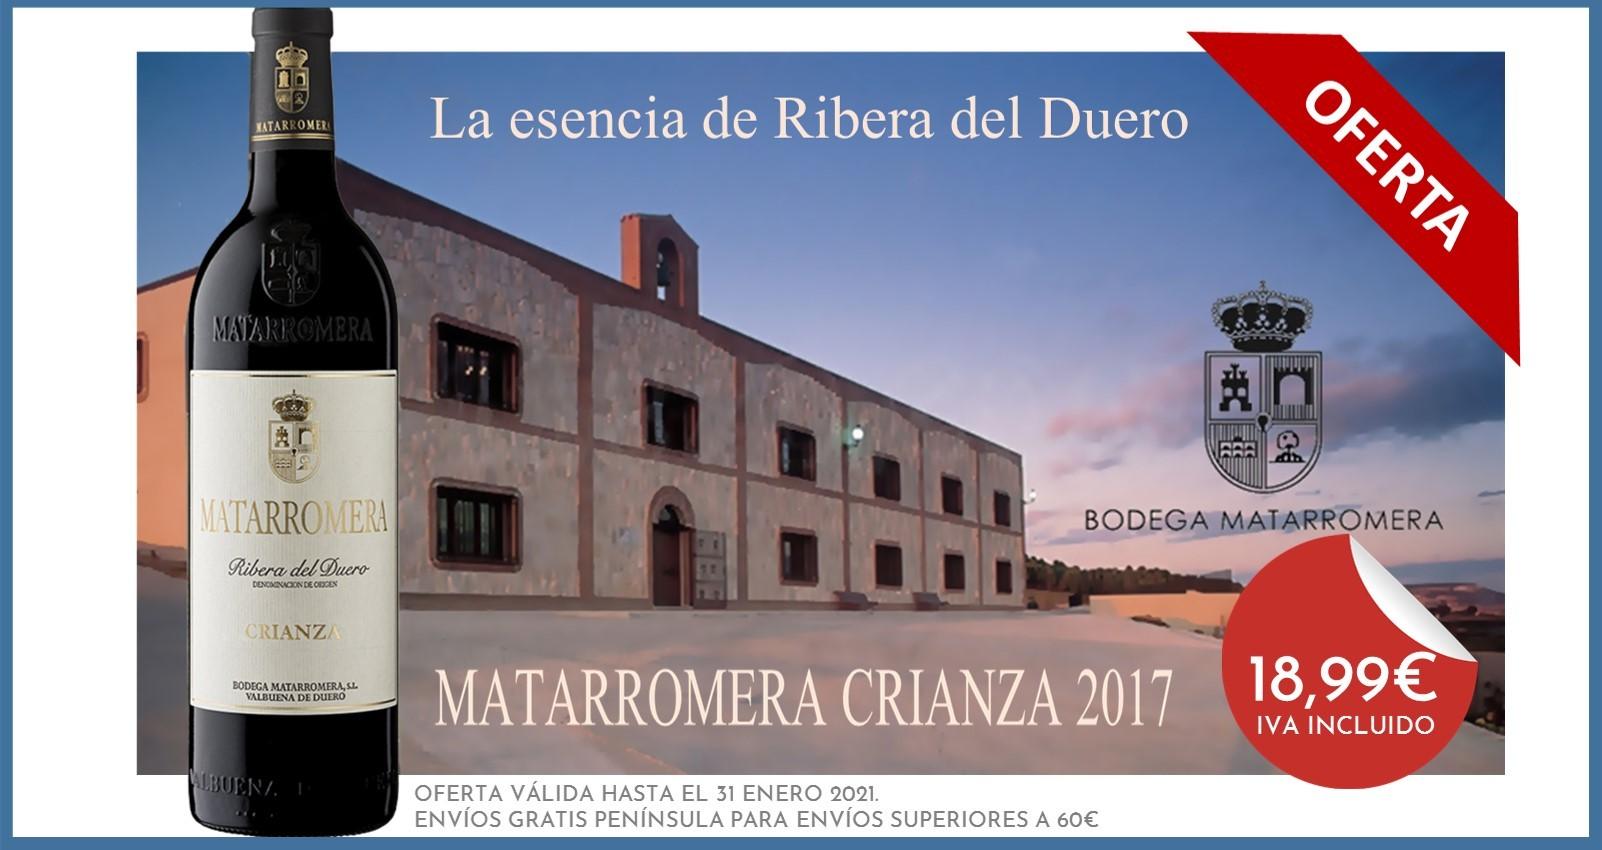 Matarromera Crianza 2017